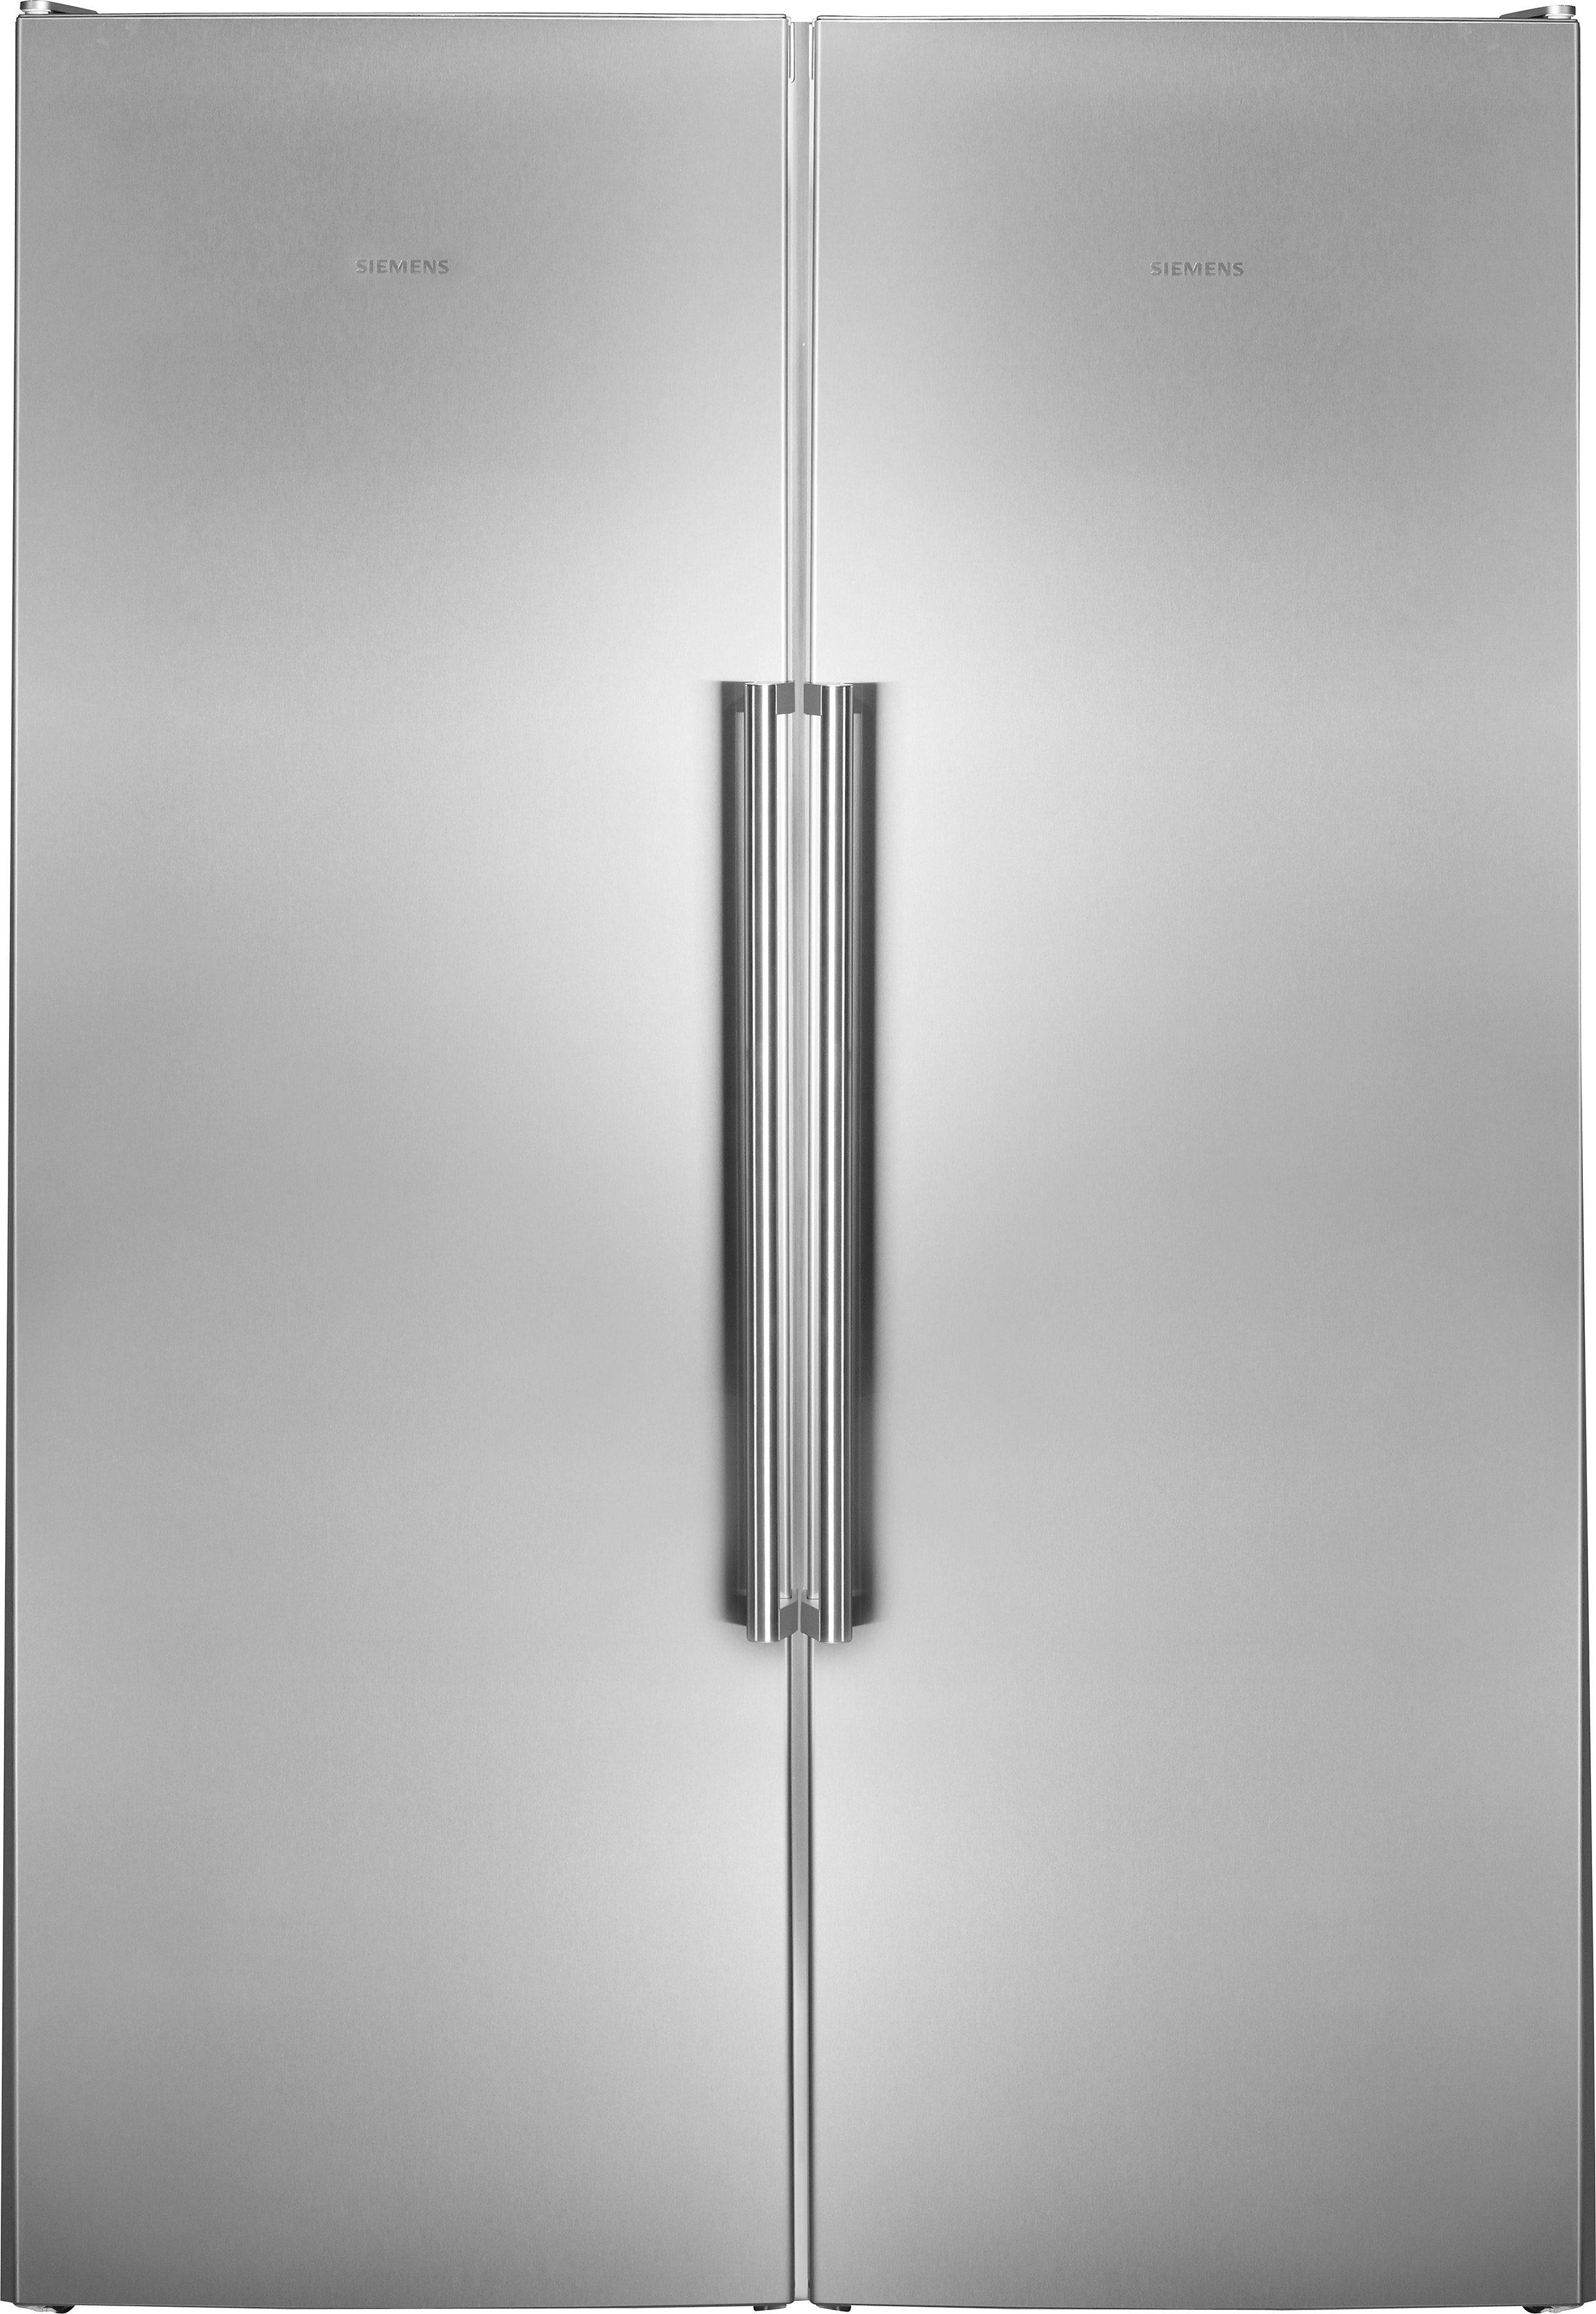 SIEMENS Side-by-Side KA99FPI30, A++, 186 cm hoch, NoFrost